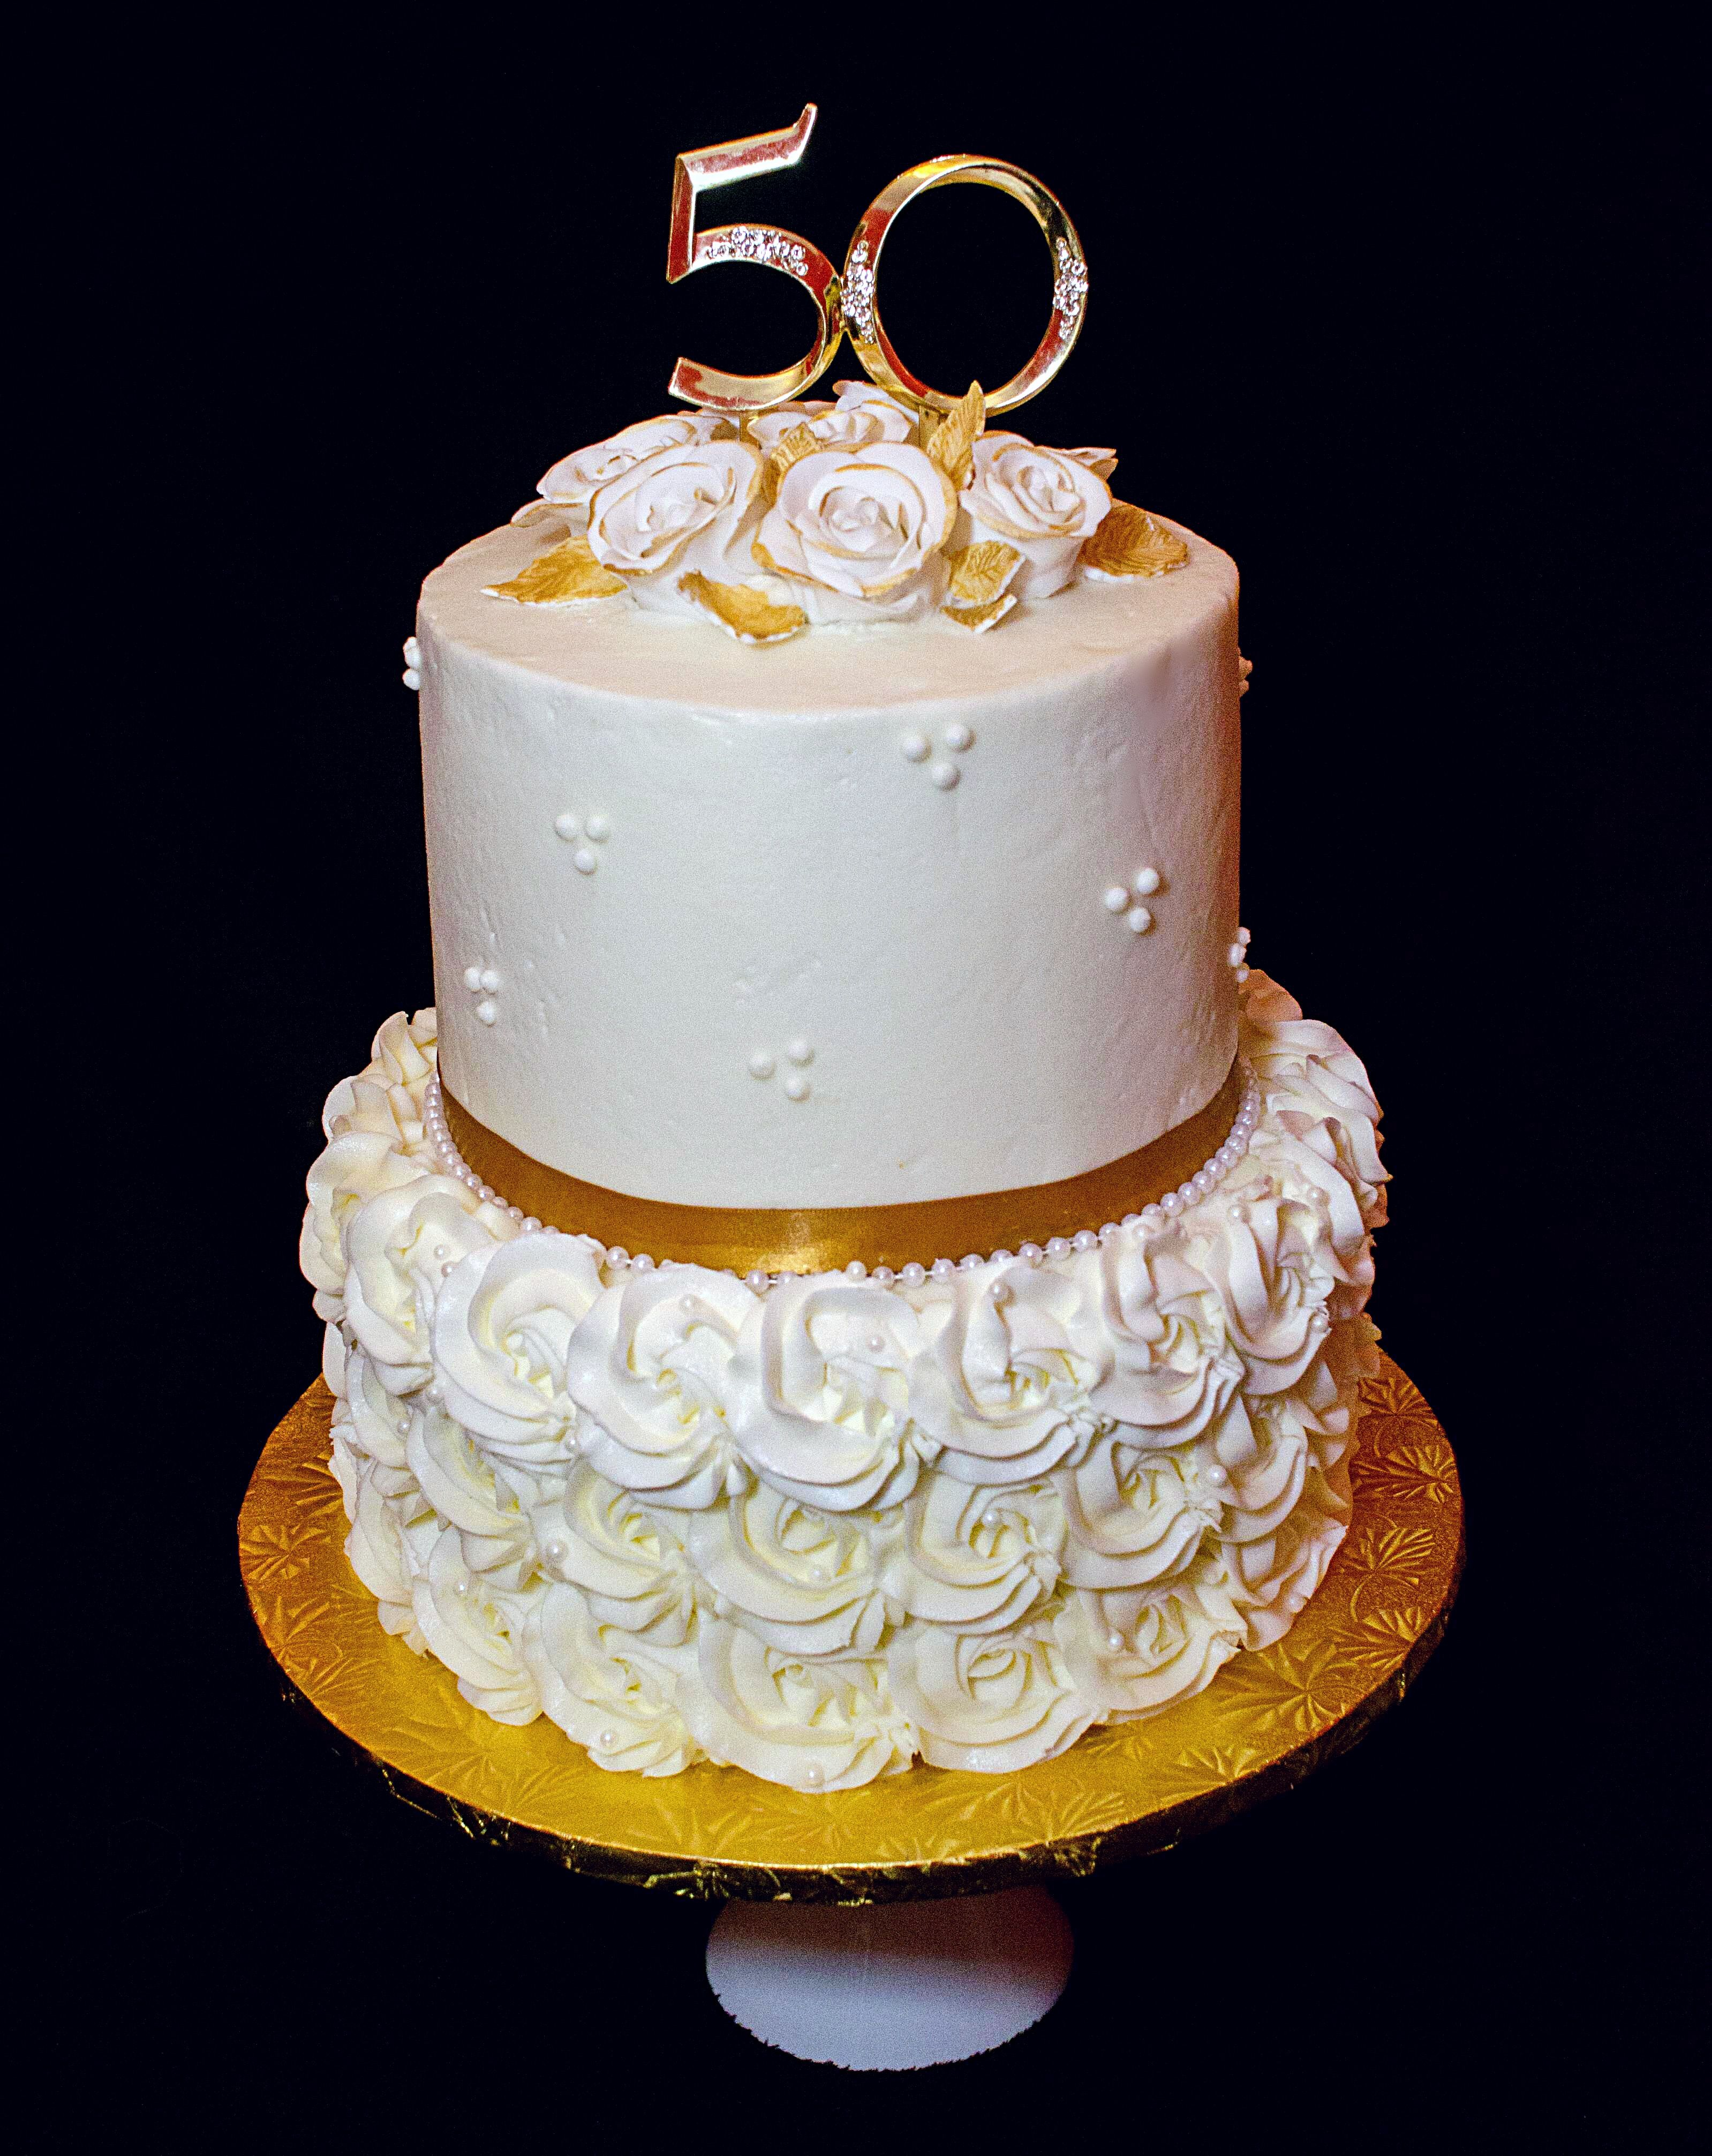 50th Wedding Anniversary Cake Gold White Ivory Pearls Sugar Roses E 50th Anniversary Cakes 50th Wedding Anniversary Cakes 50th Wedding Anniversary Cakes Gold